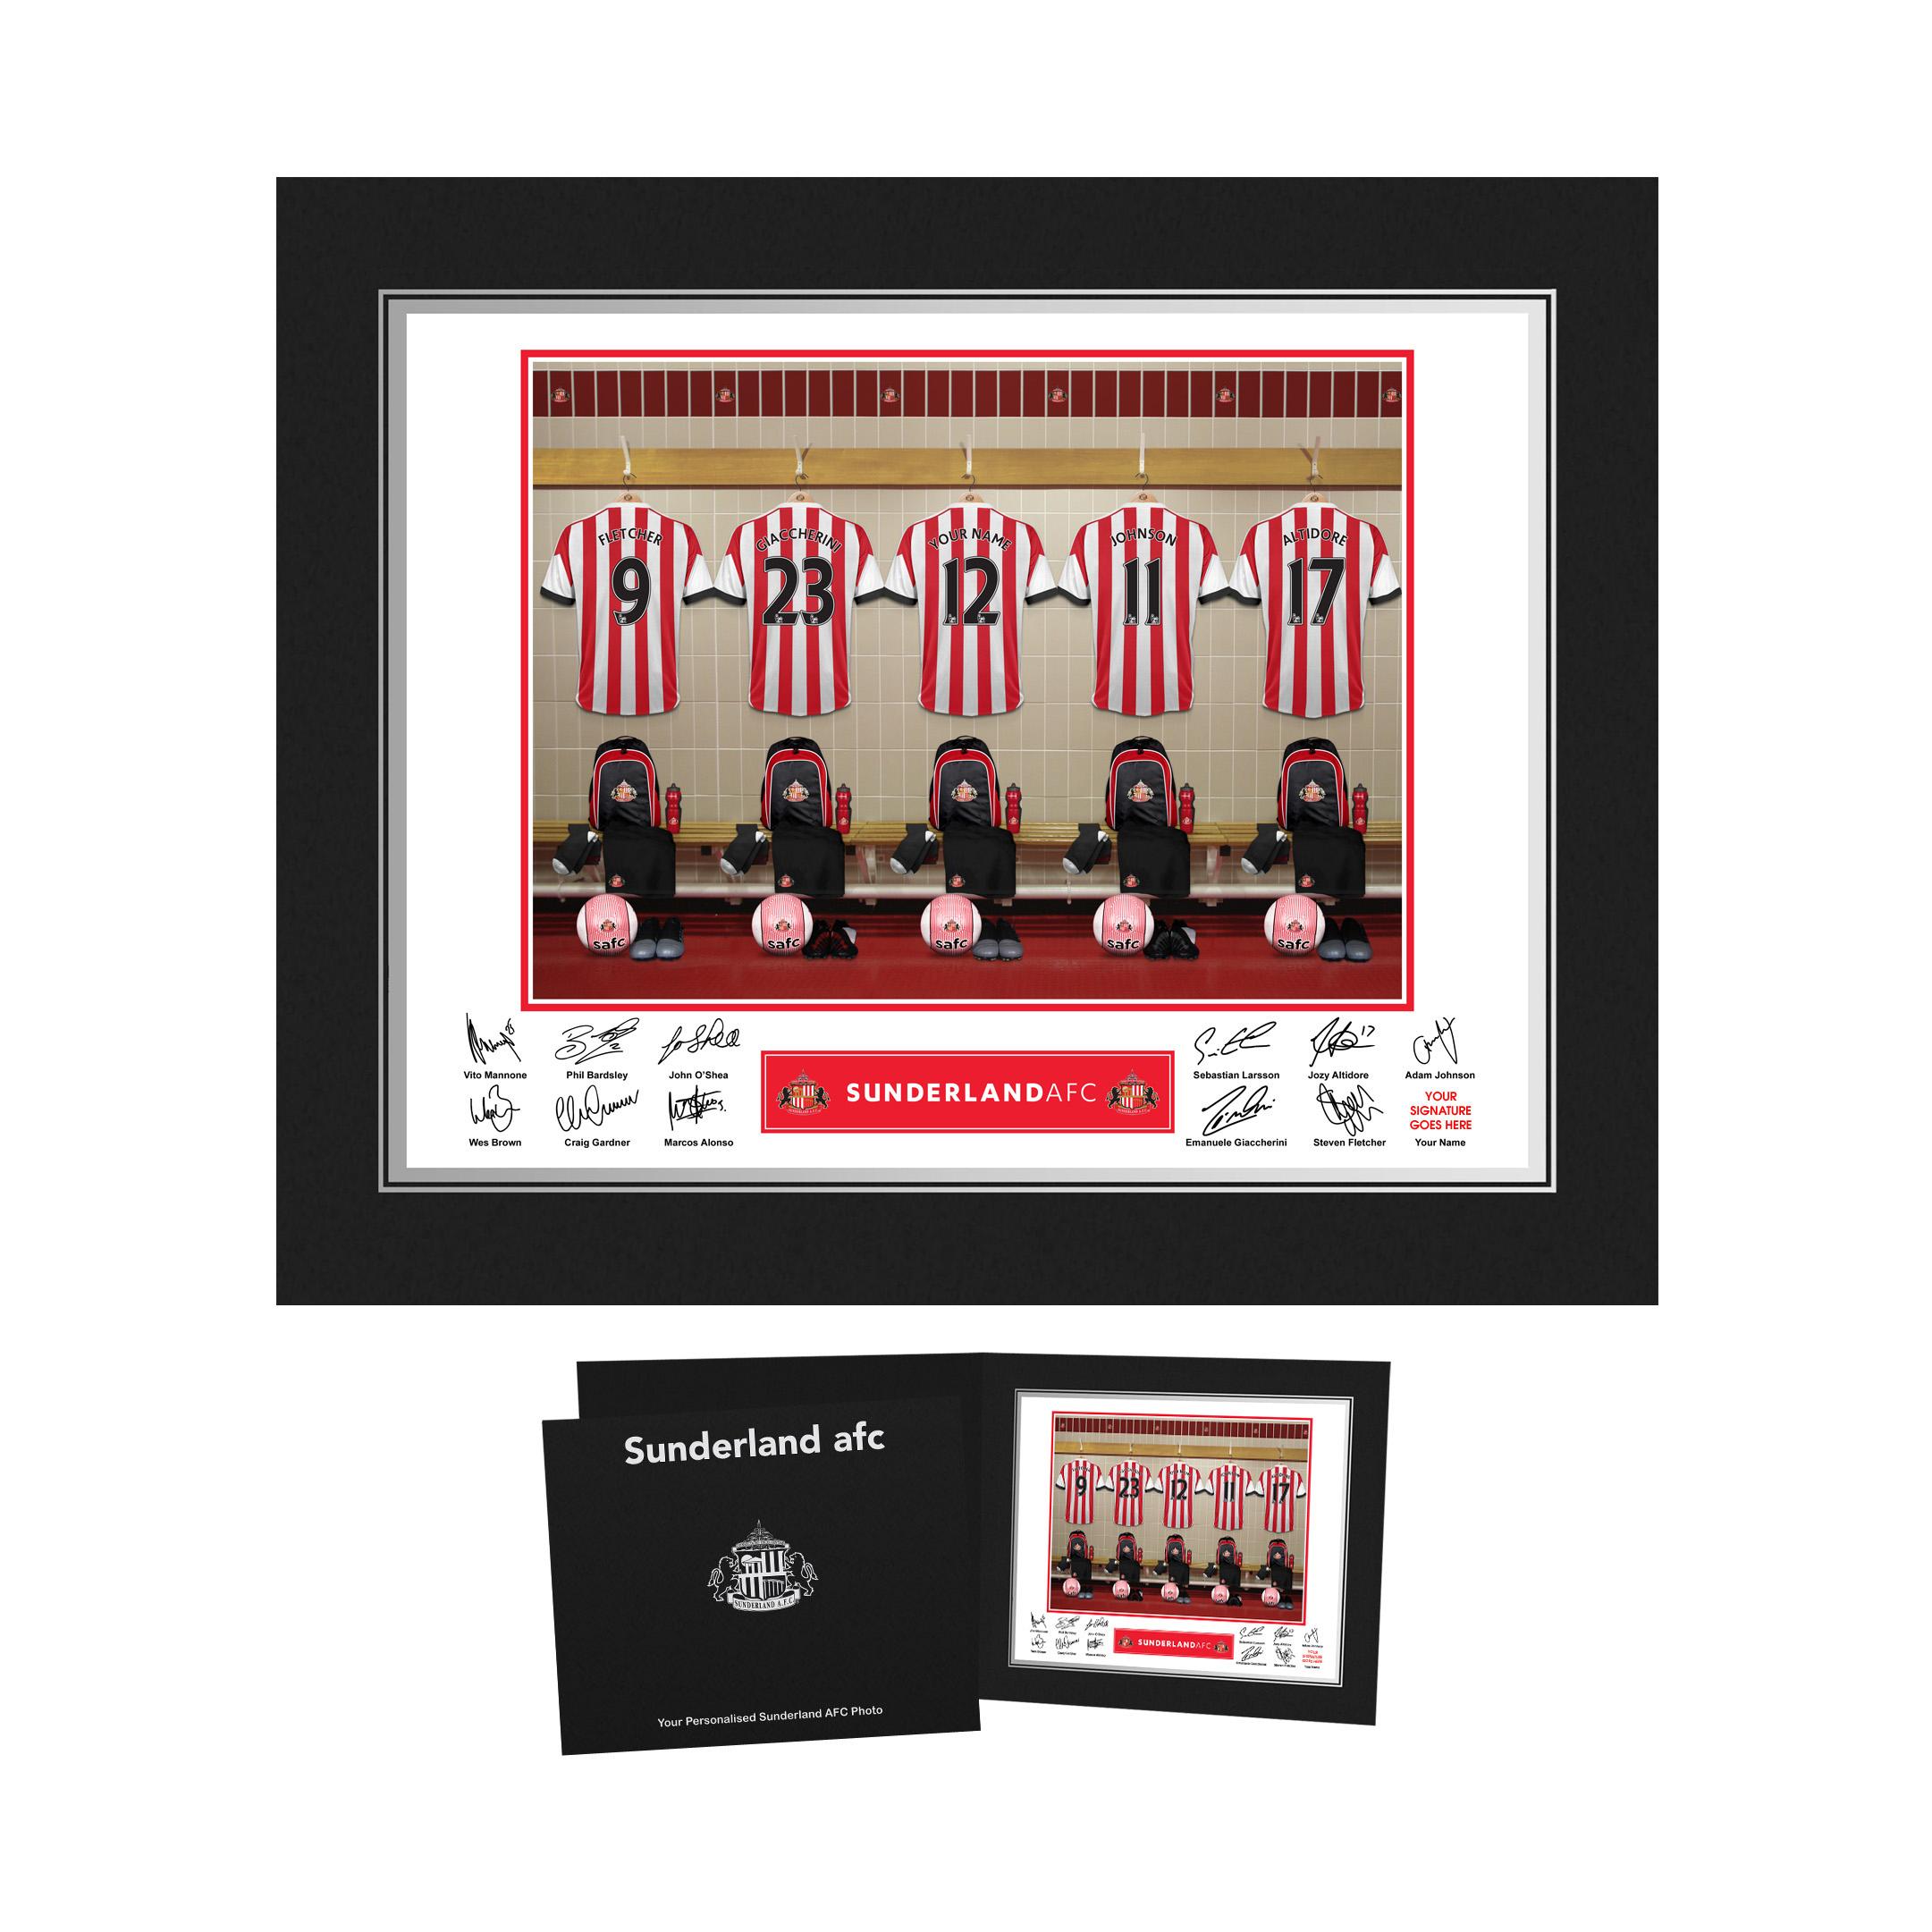 Sunderland Personalised Dressing Room Photo in Presentation Folder